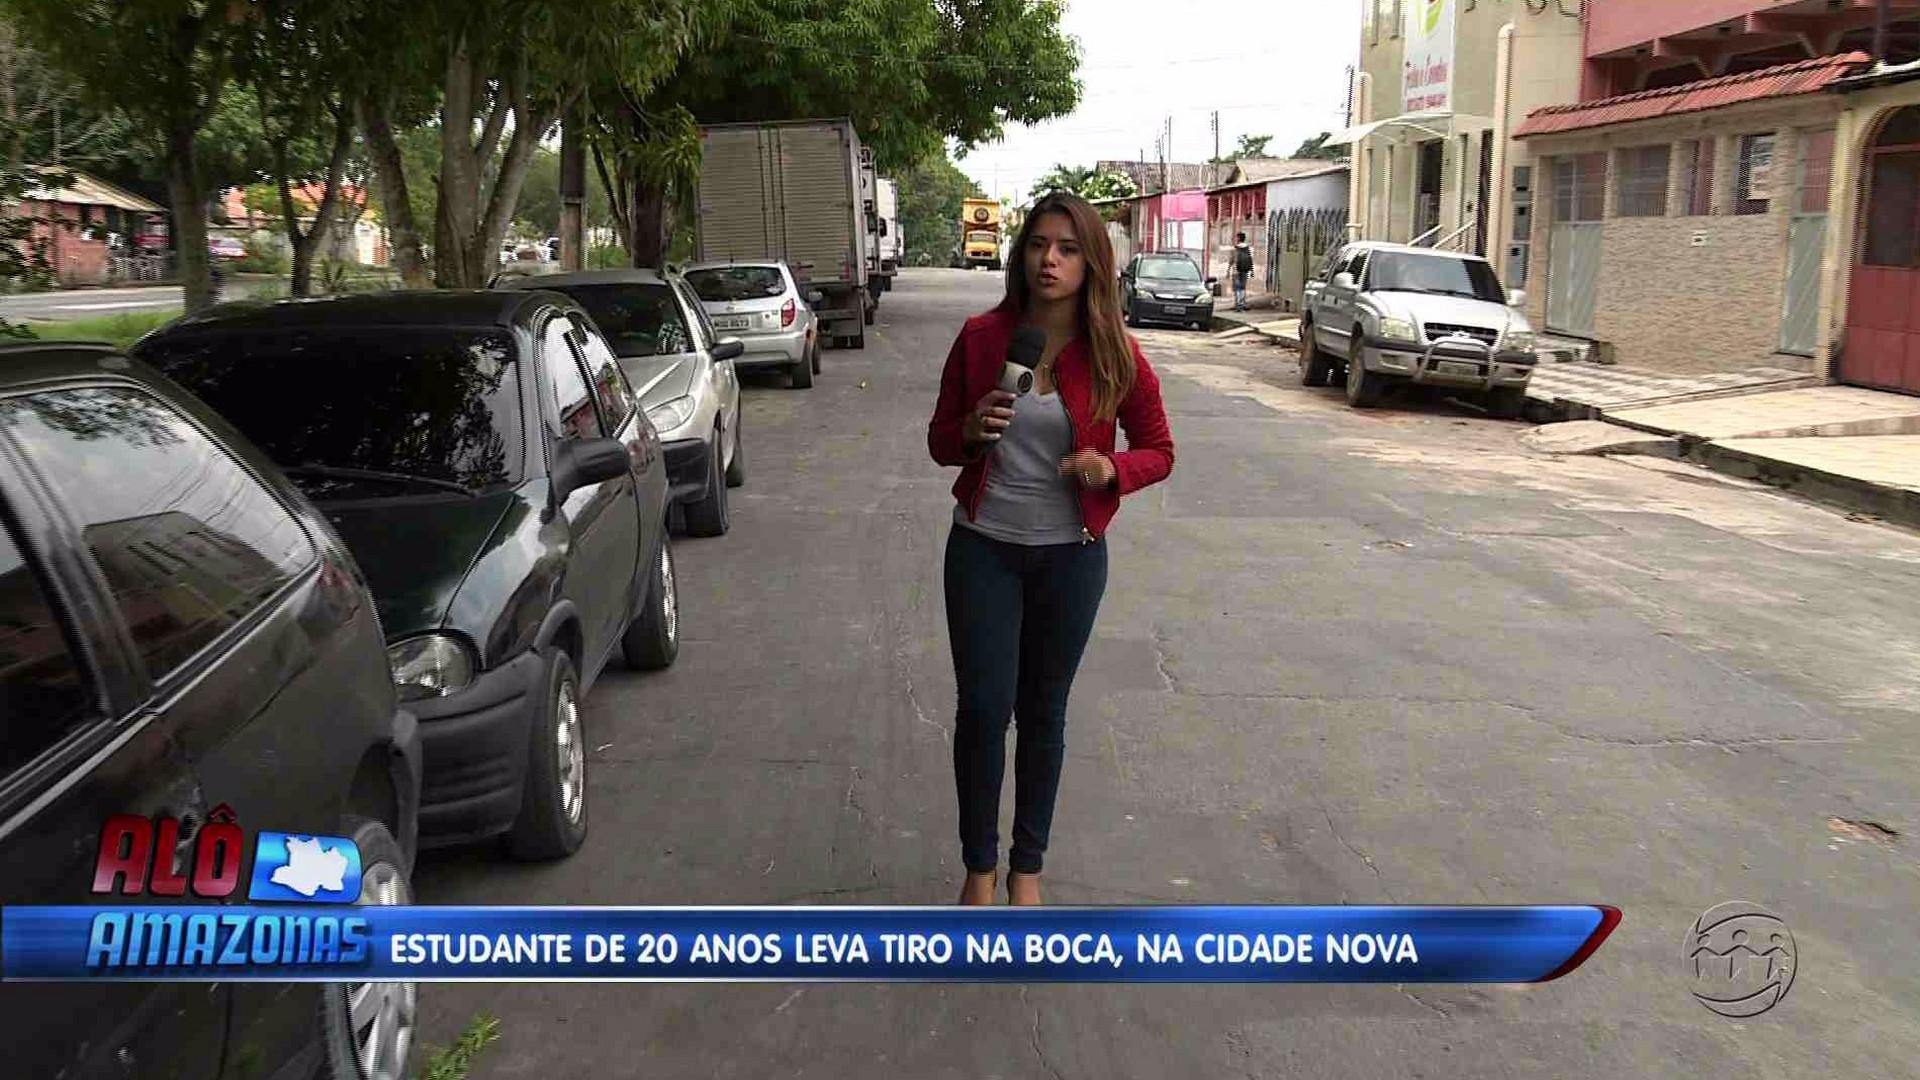 ESTUDANTE LEVA TIRO NA BOCA E TEM OS LÁBIOS PERFURADOS - Alô Amazonas 17/11/17